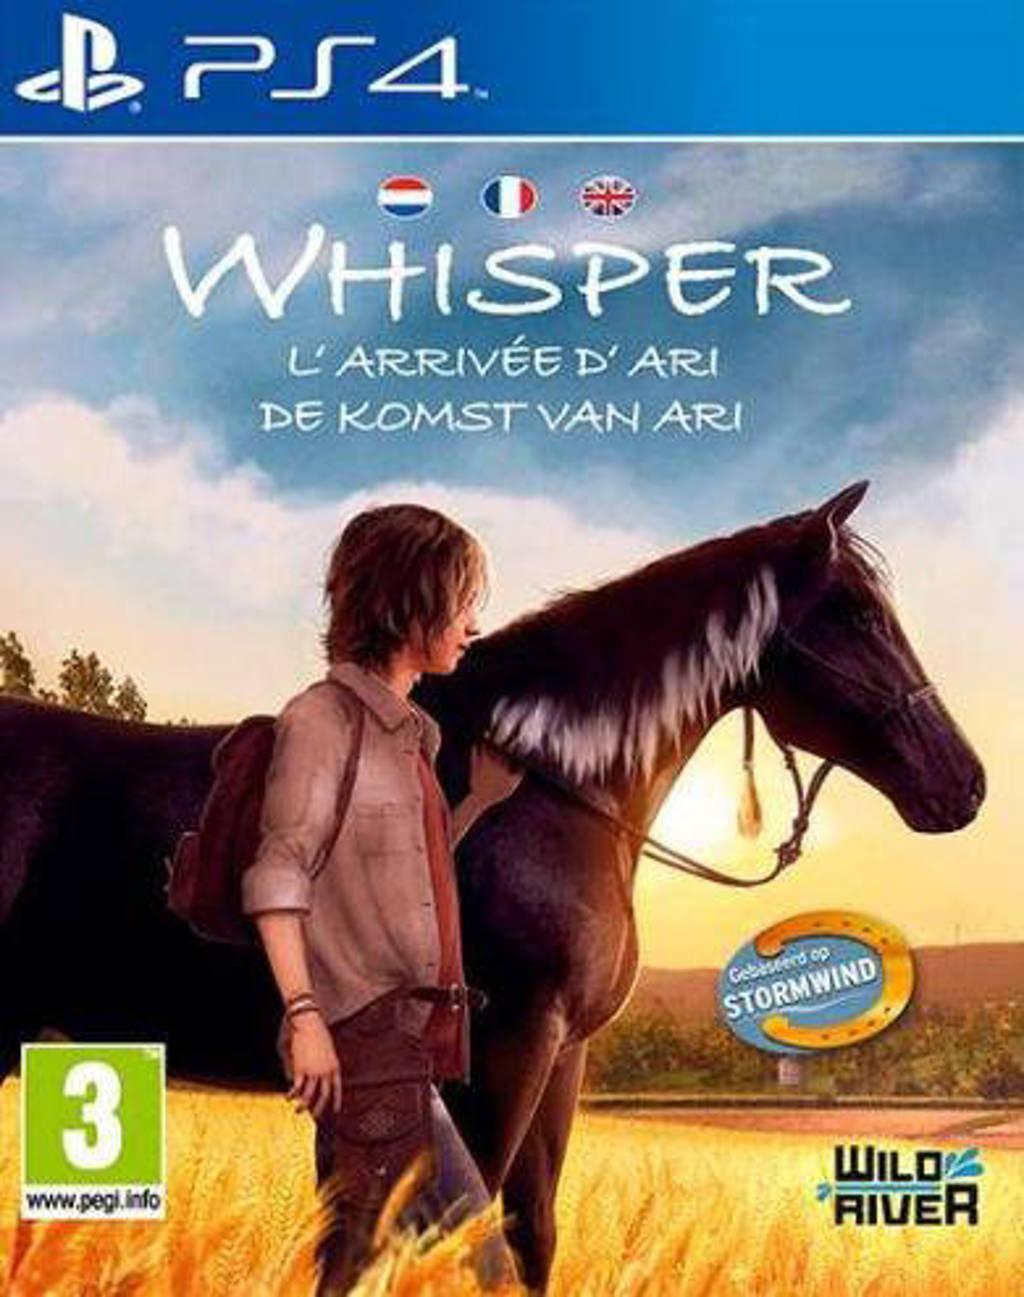 Whisper - De komst van Ari (PlayStation 4)